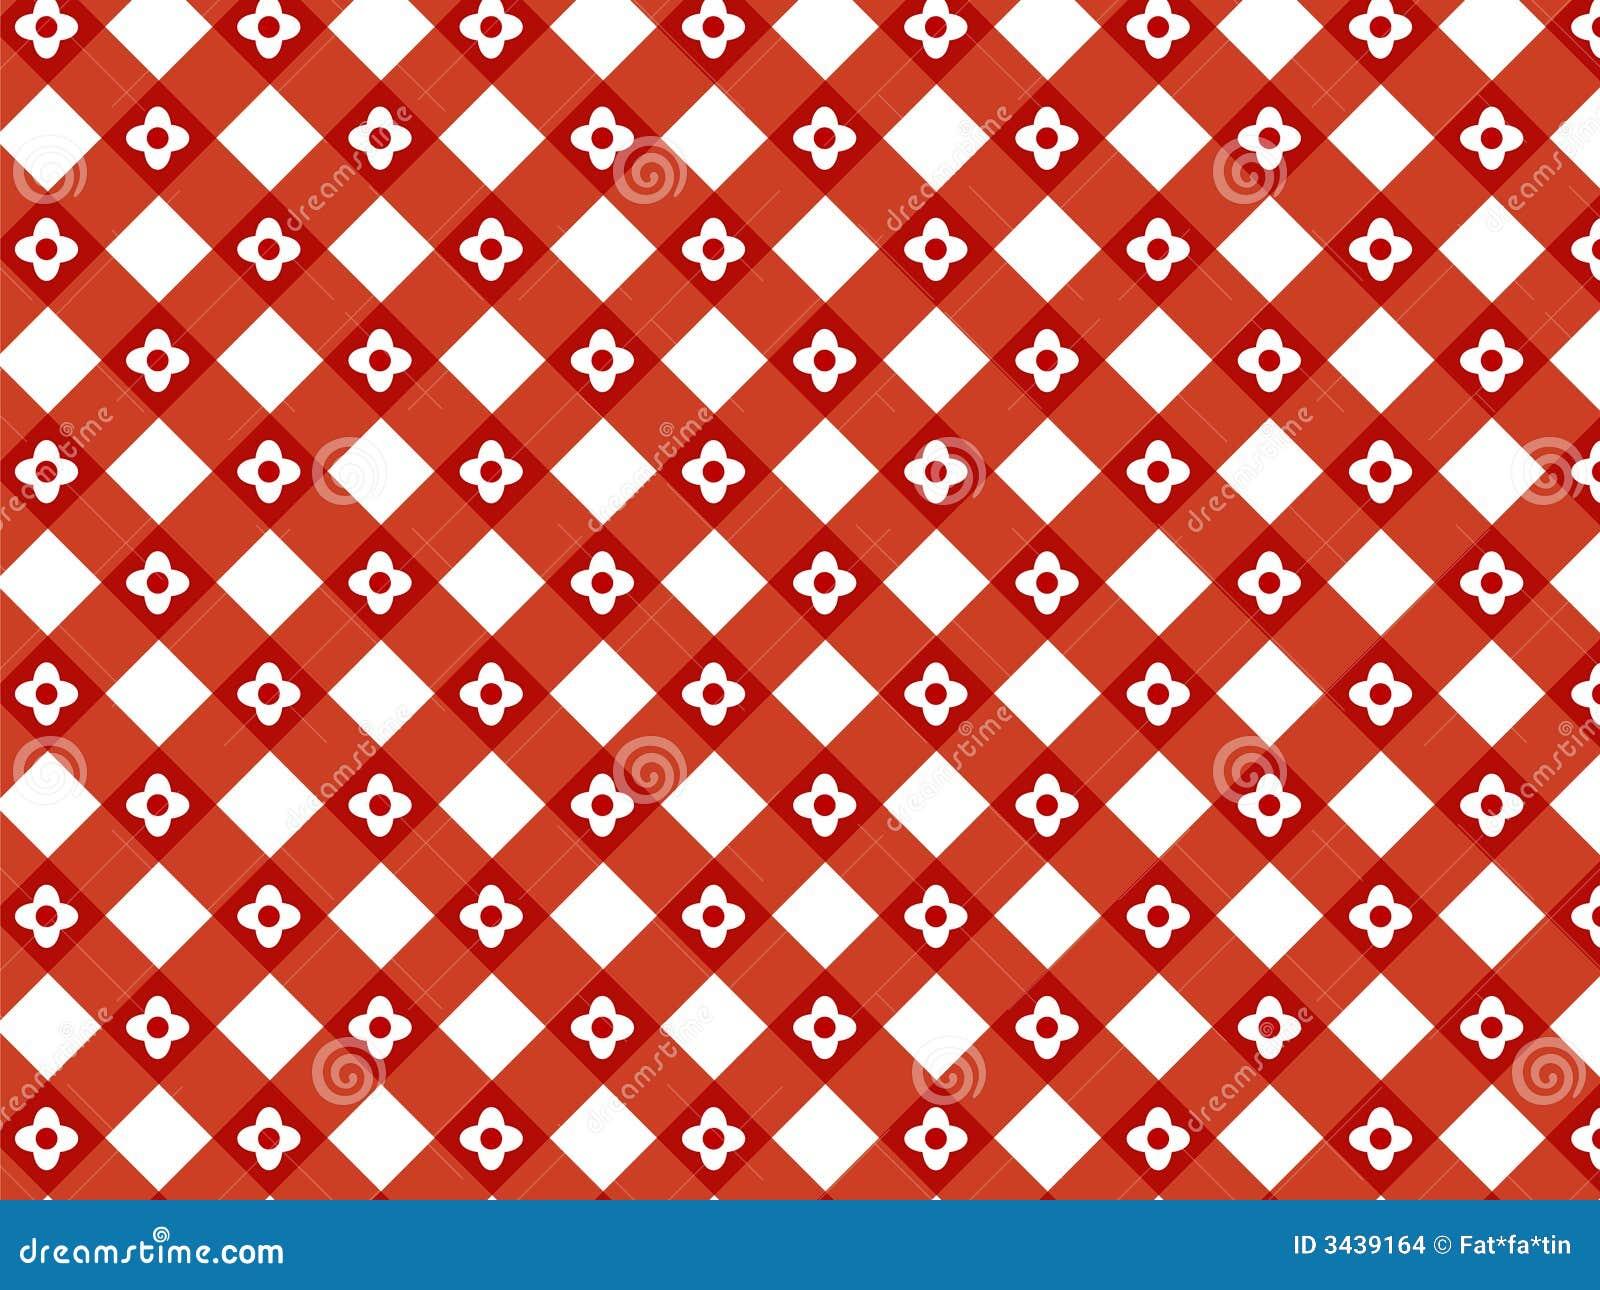 Retro flower red plaid pattern